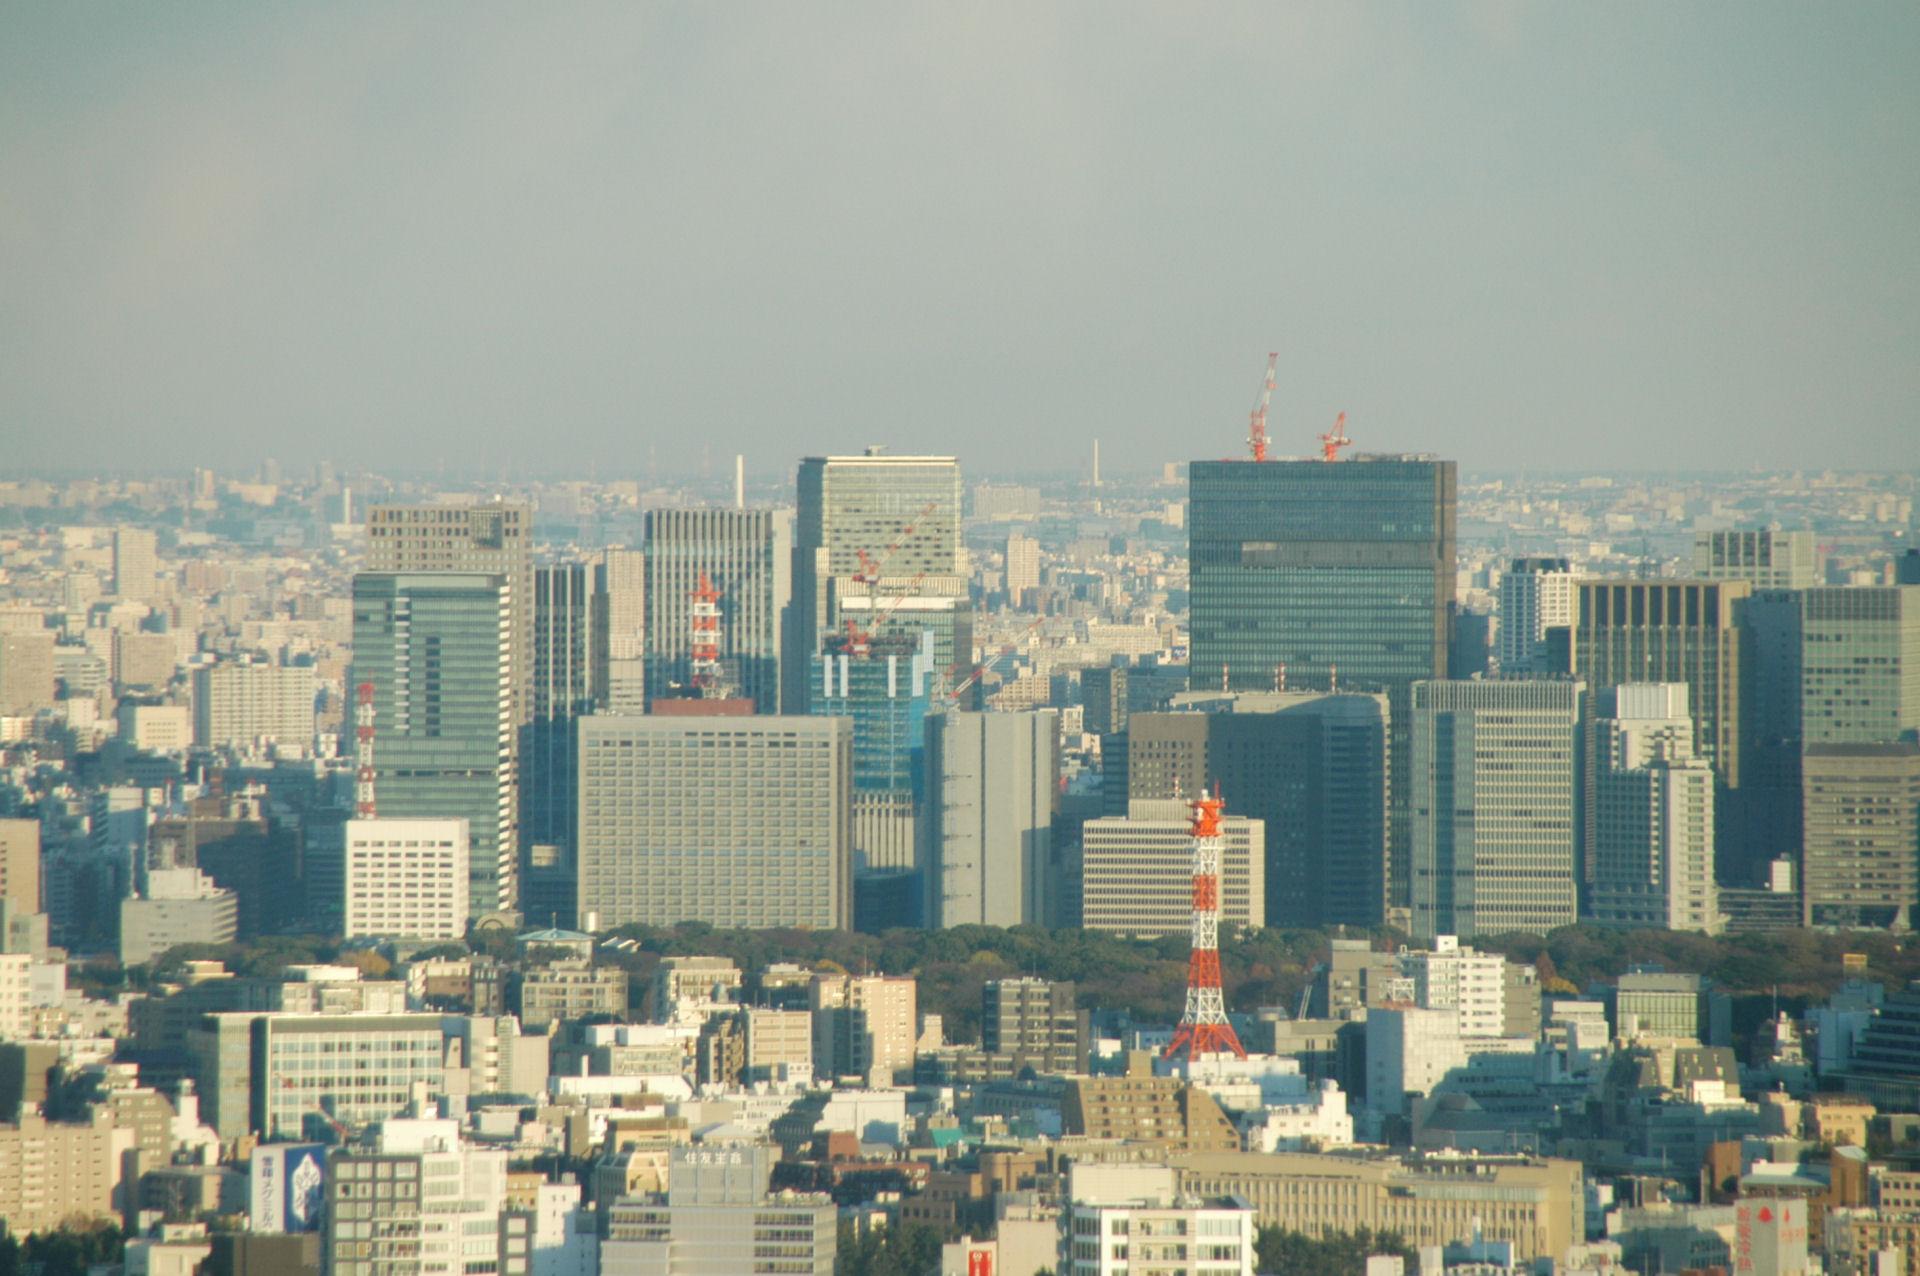 shintocho0168.jpg